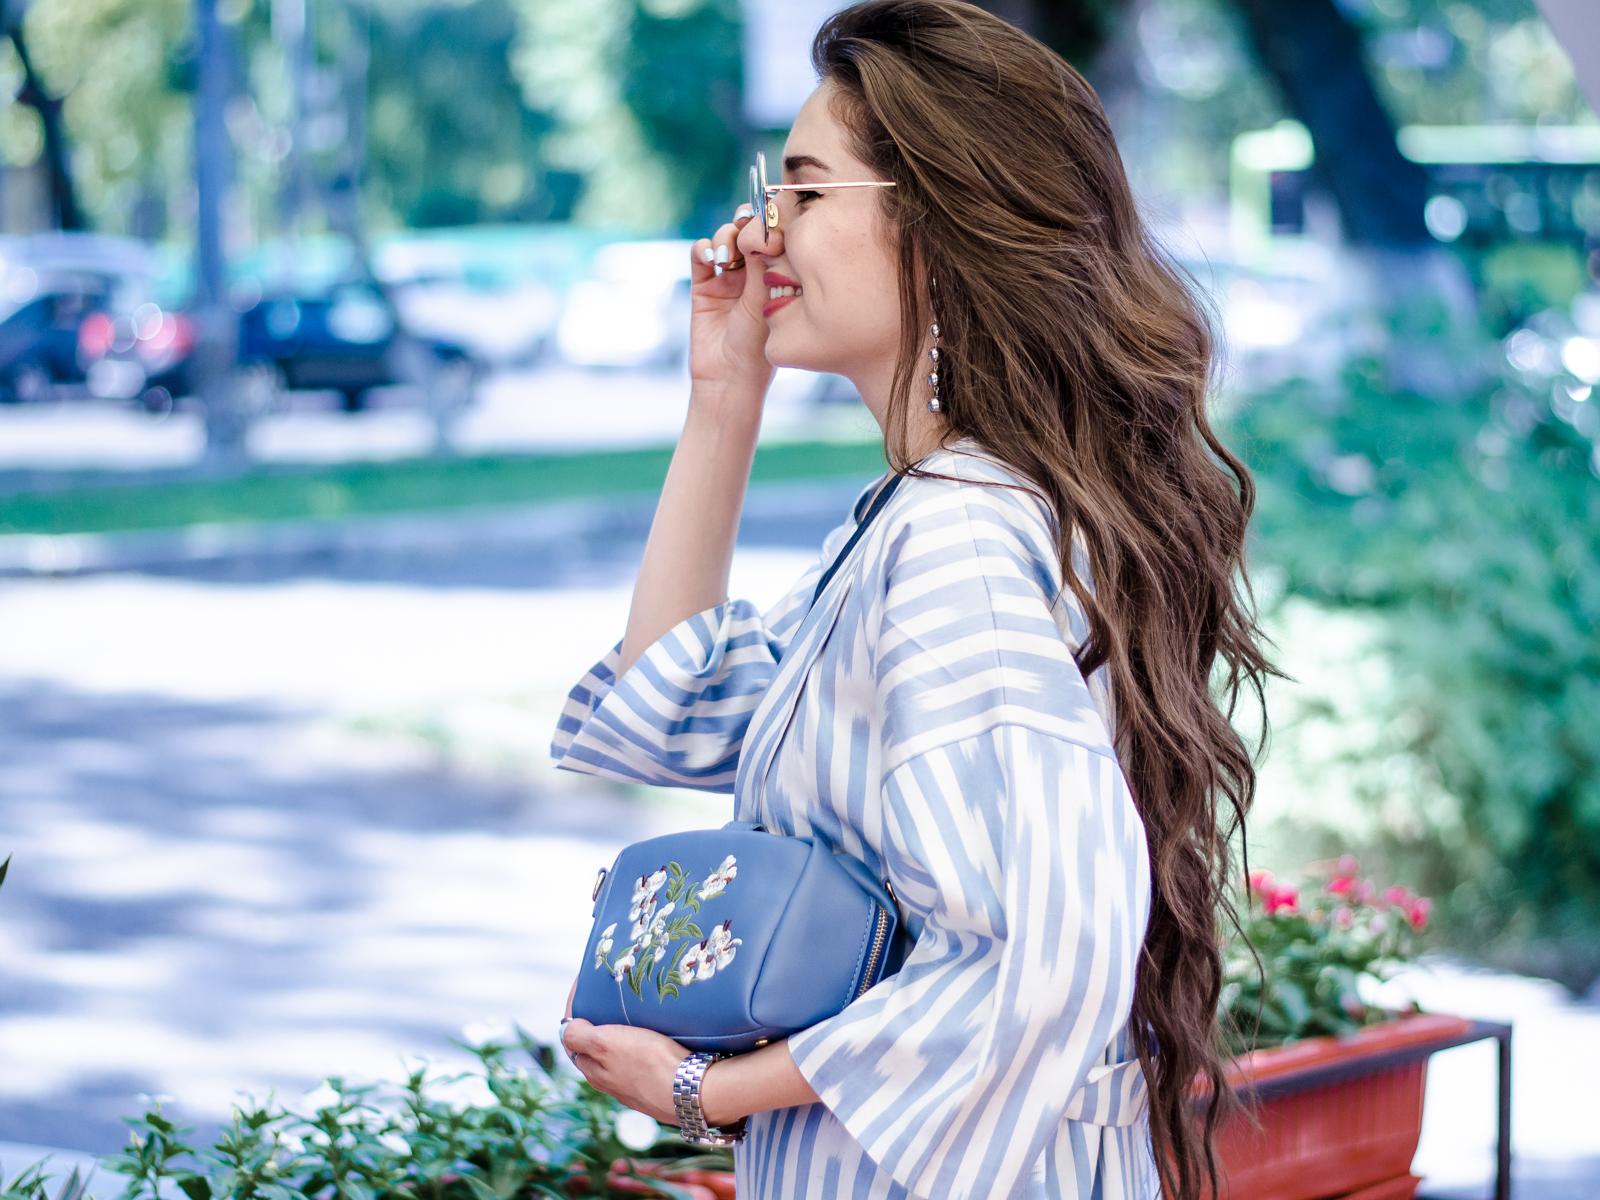 diyorasnotes diyora beta fashion blogger style outfitoftheday lookoftheday blue midi dress uzbek print embroidery bag